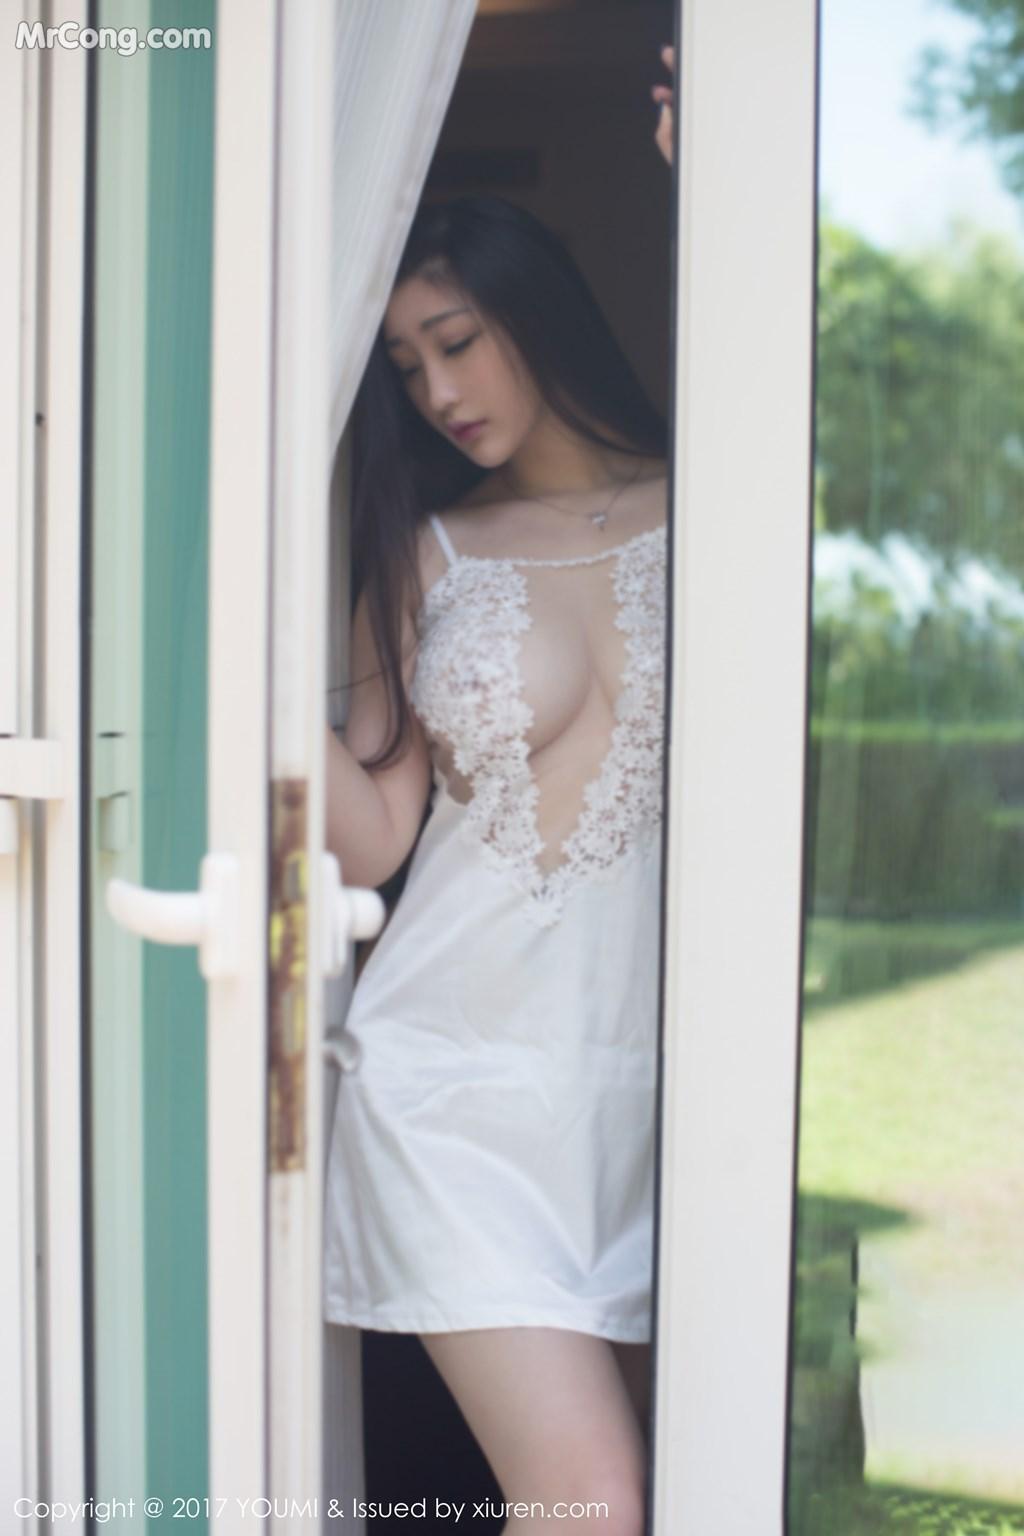 Image YouMi-Vol.077-Daji-Toxic-MrCong.com-038 in post YouMi Vol.077: Người mẫu Daji_Toxic (妲己_Toxic) (49 ảnh)